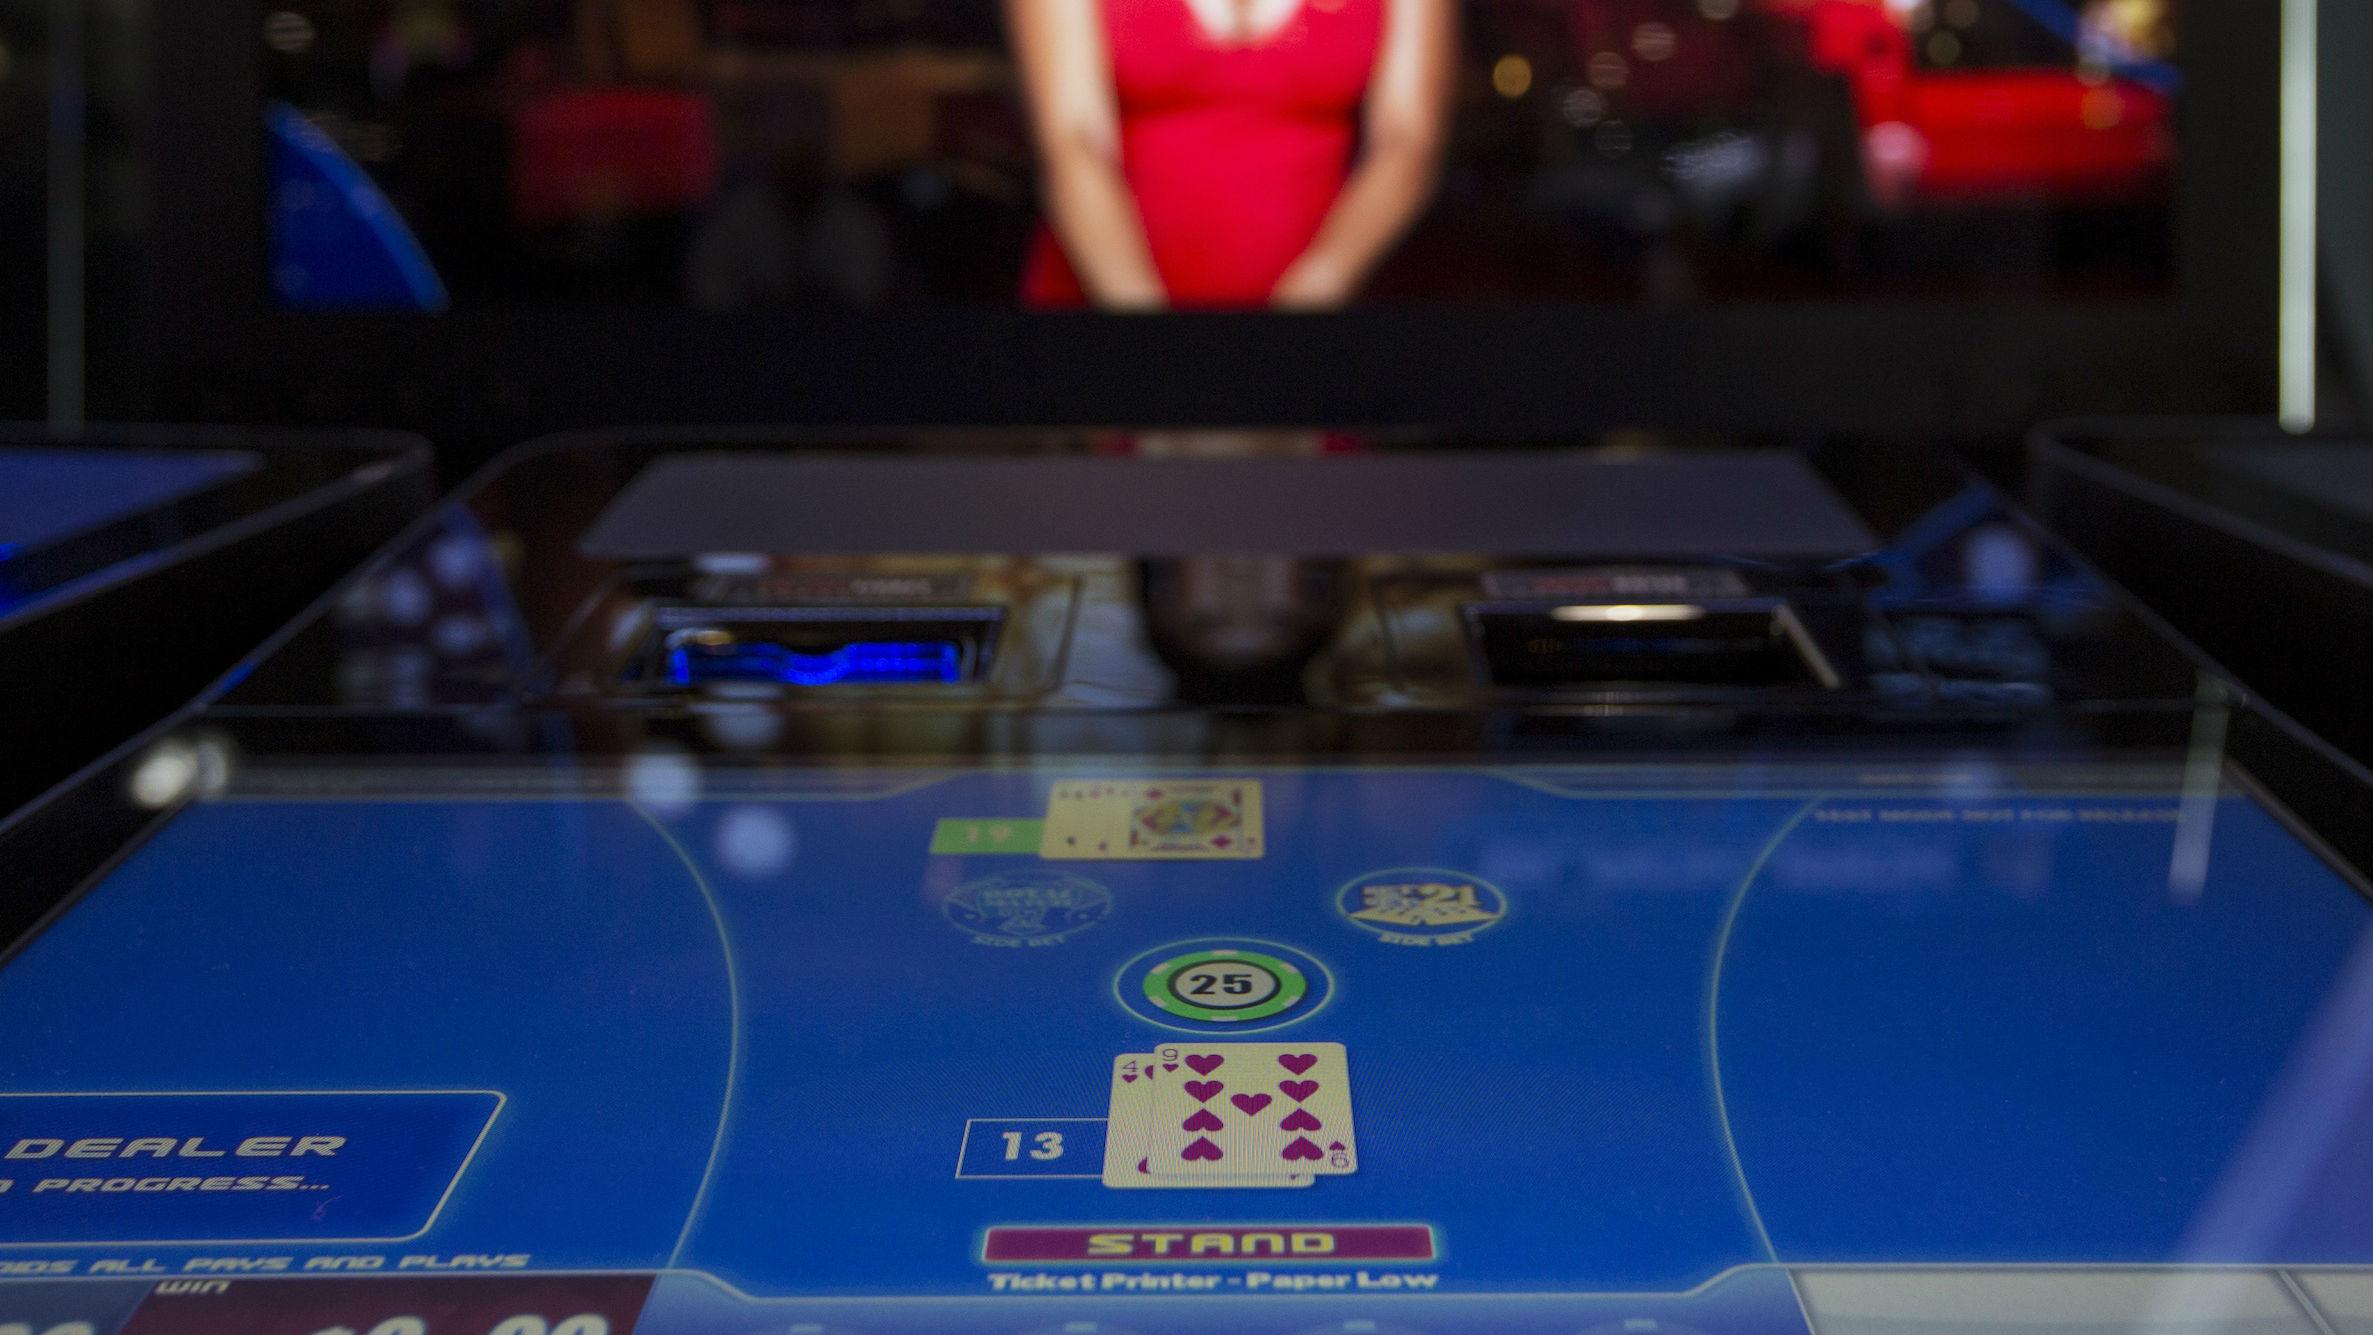 Smoking in vegas casinos 2014 crown casino in perth australia